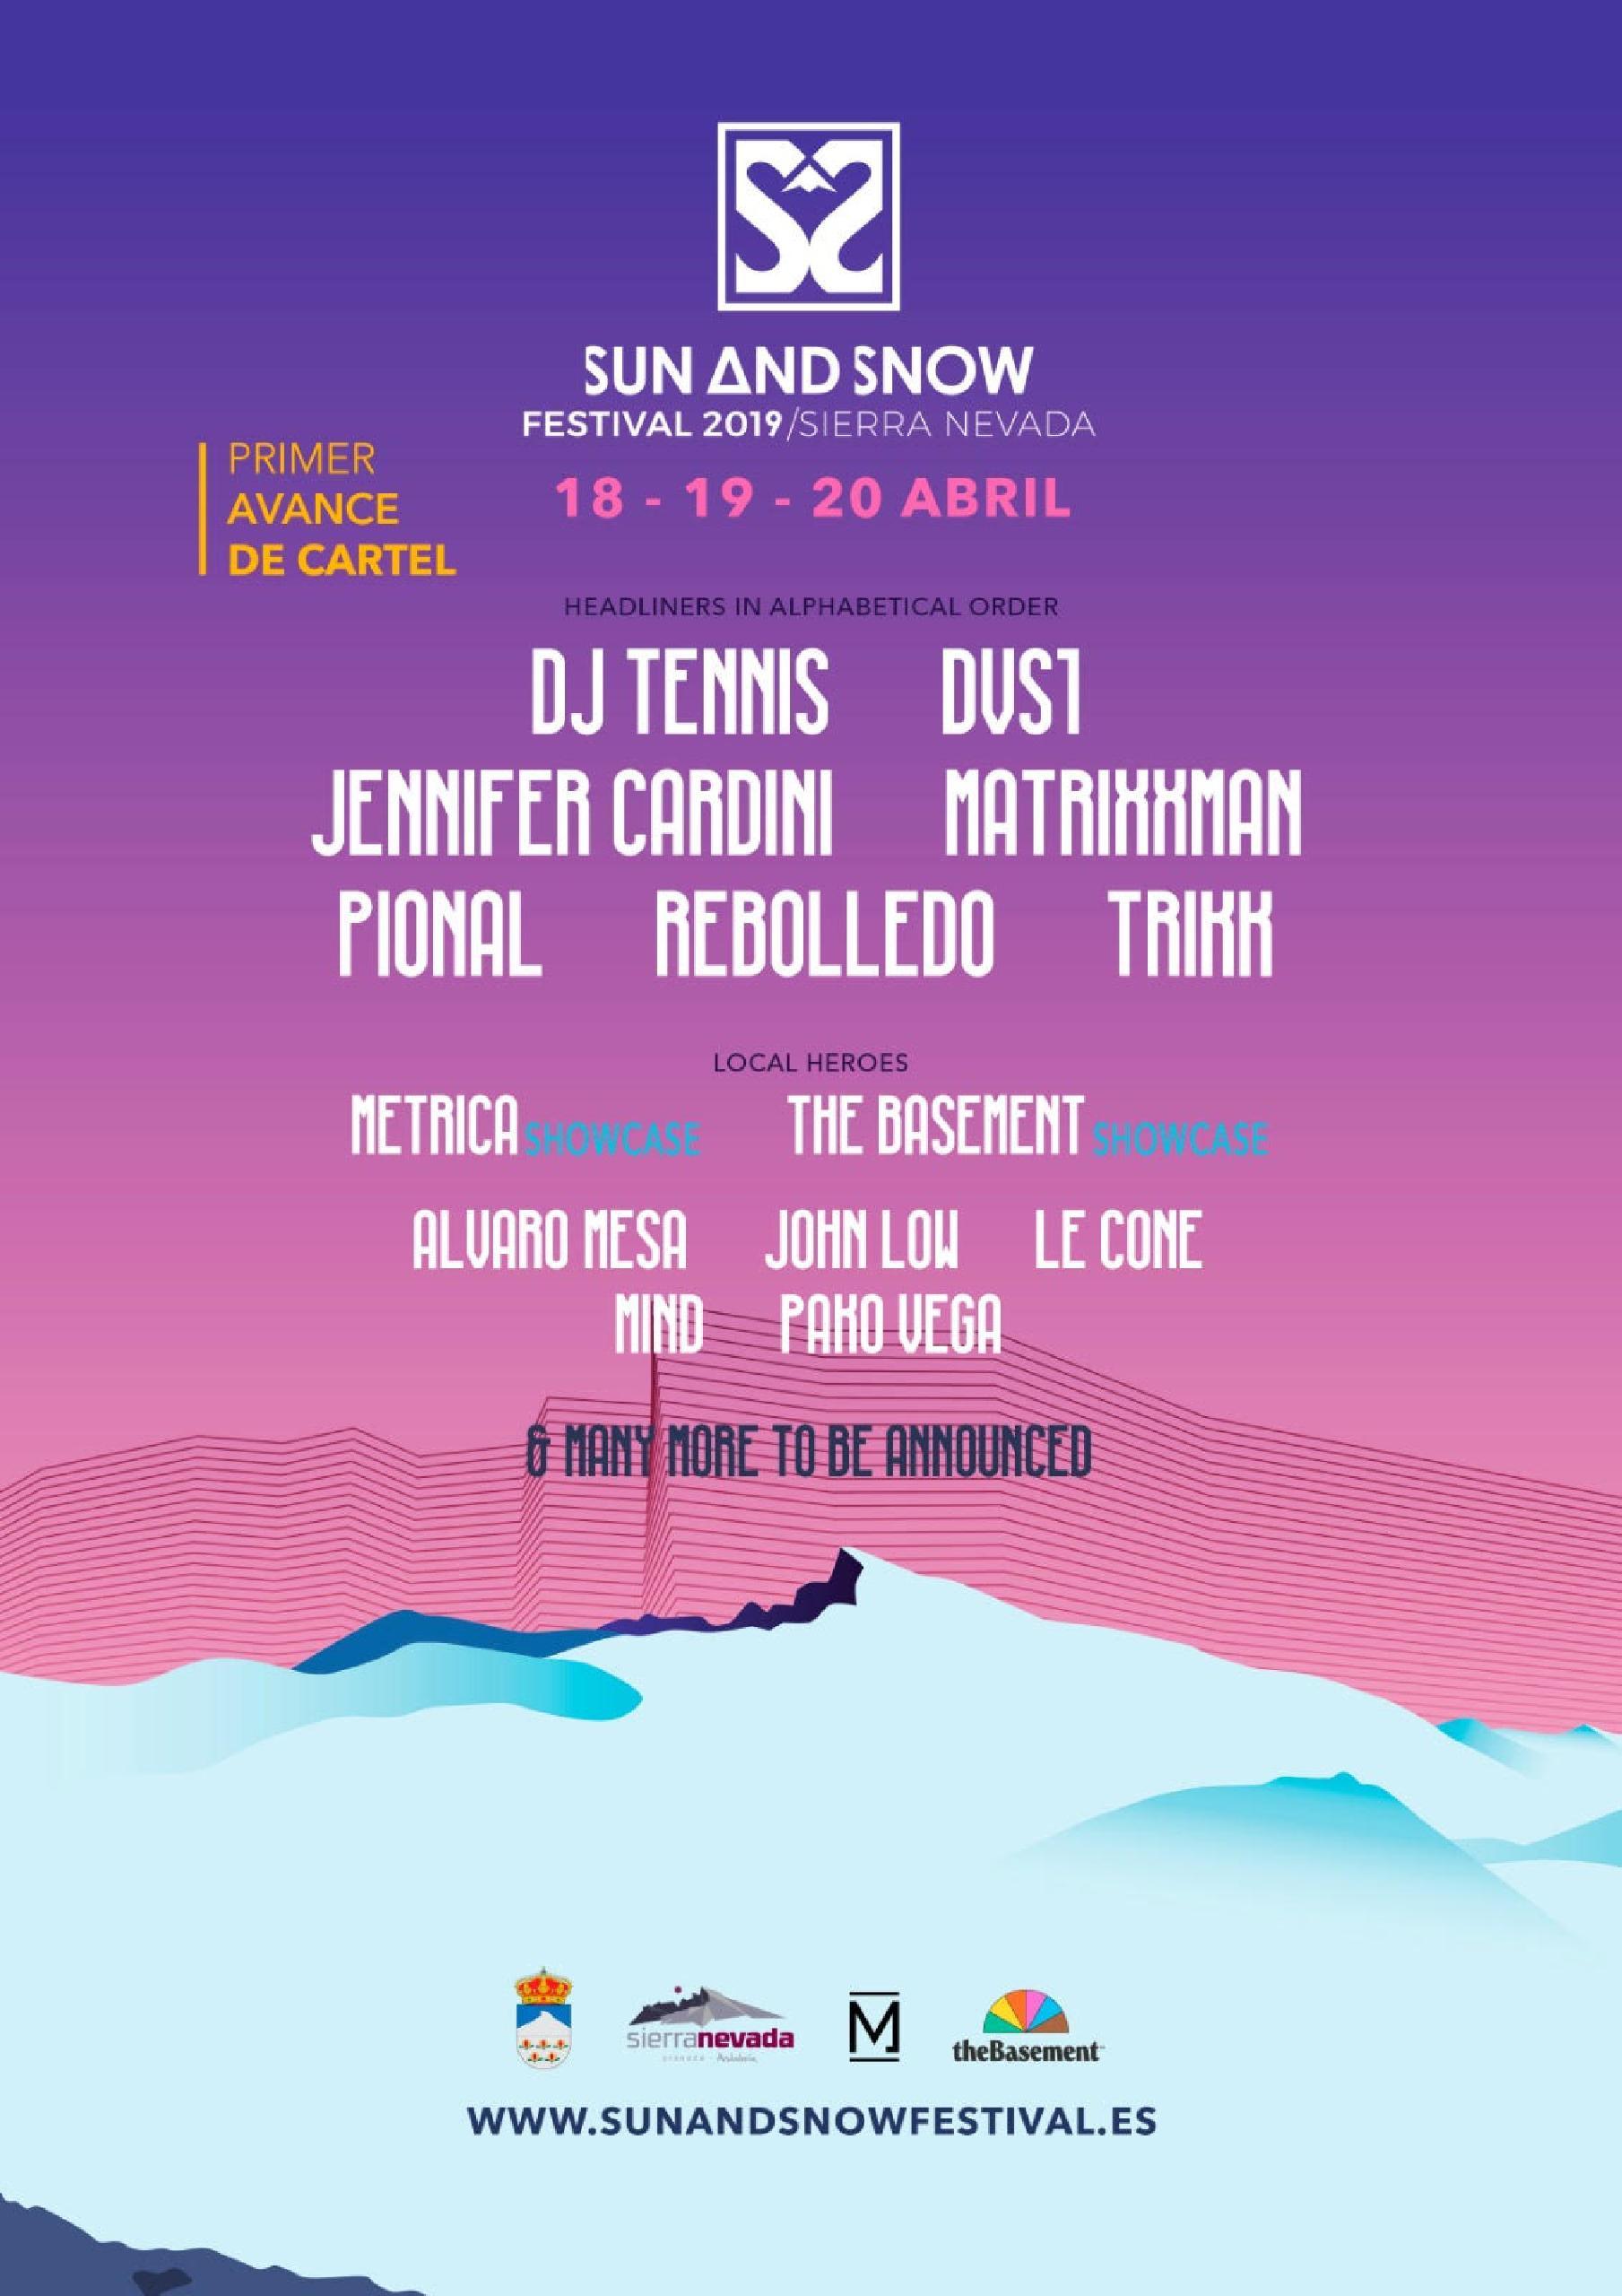 Primer avance de cartel Sun And Snow Festival 2019